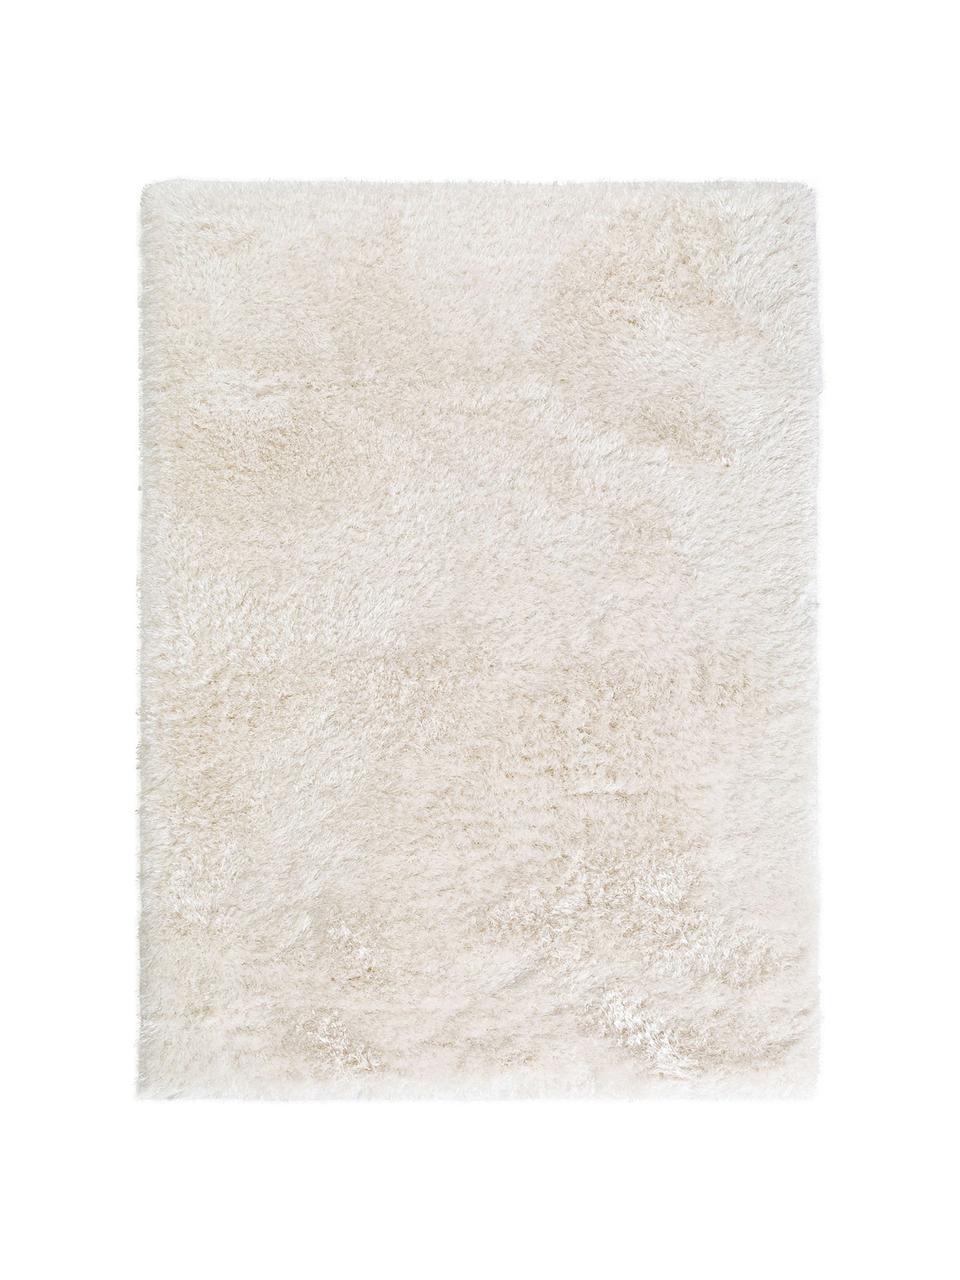 tapis blanc poils longs lea